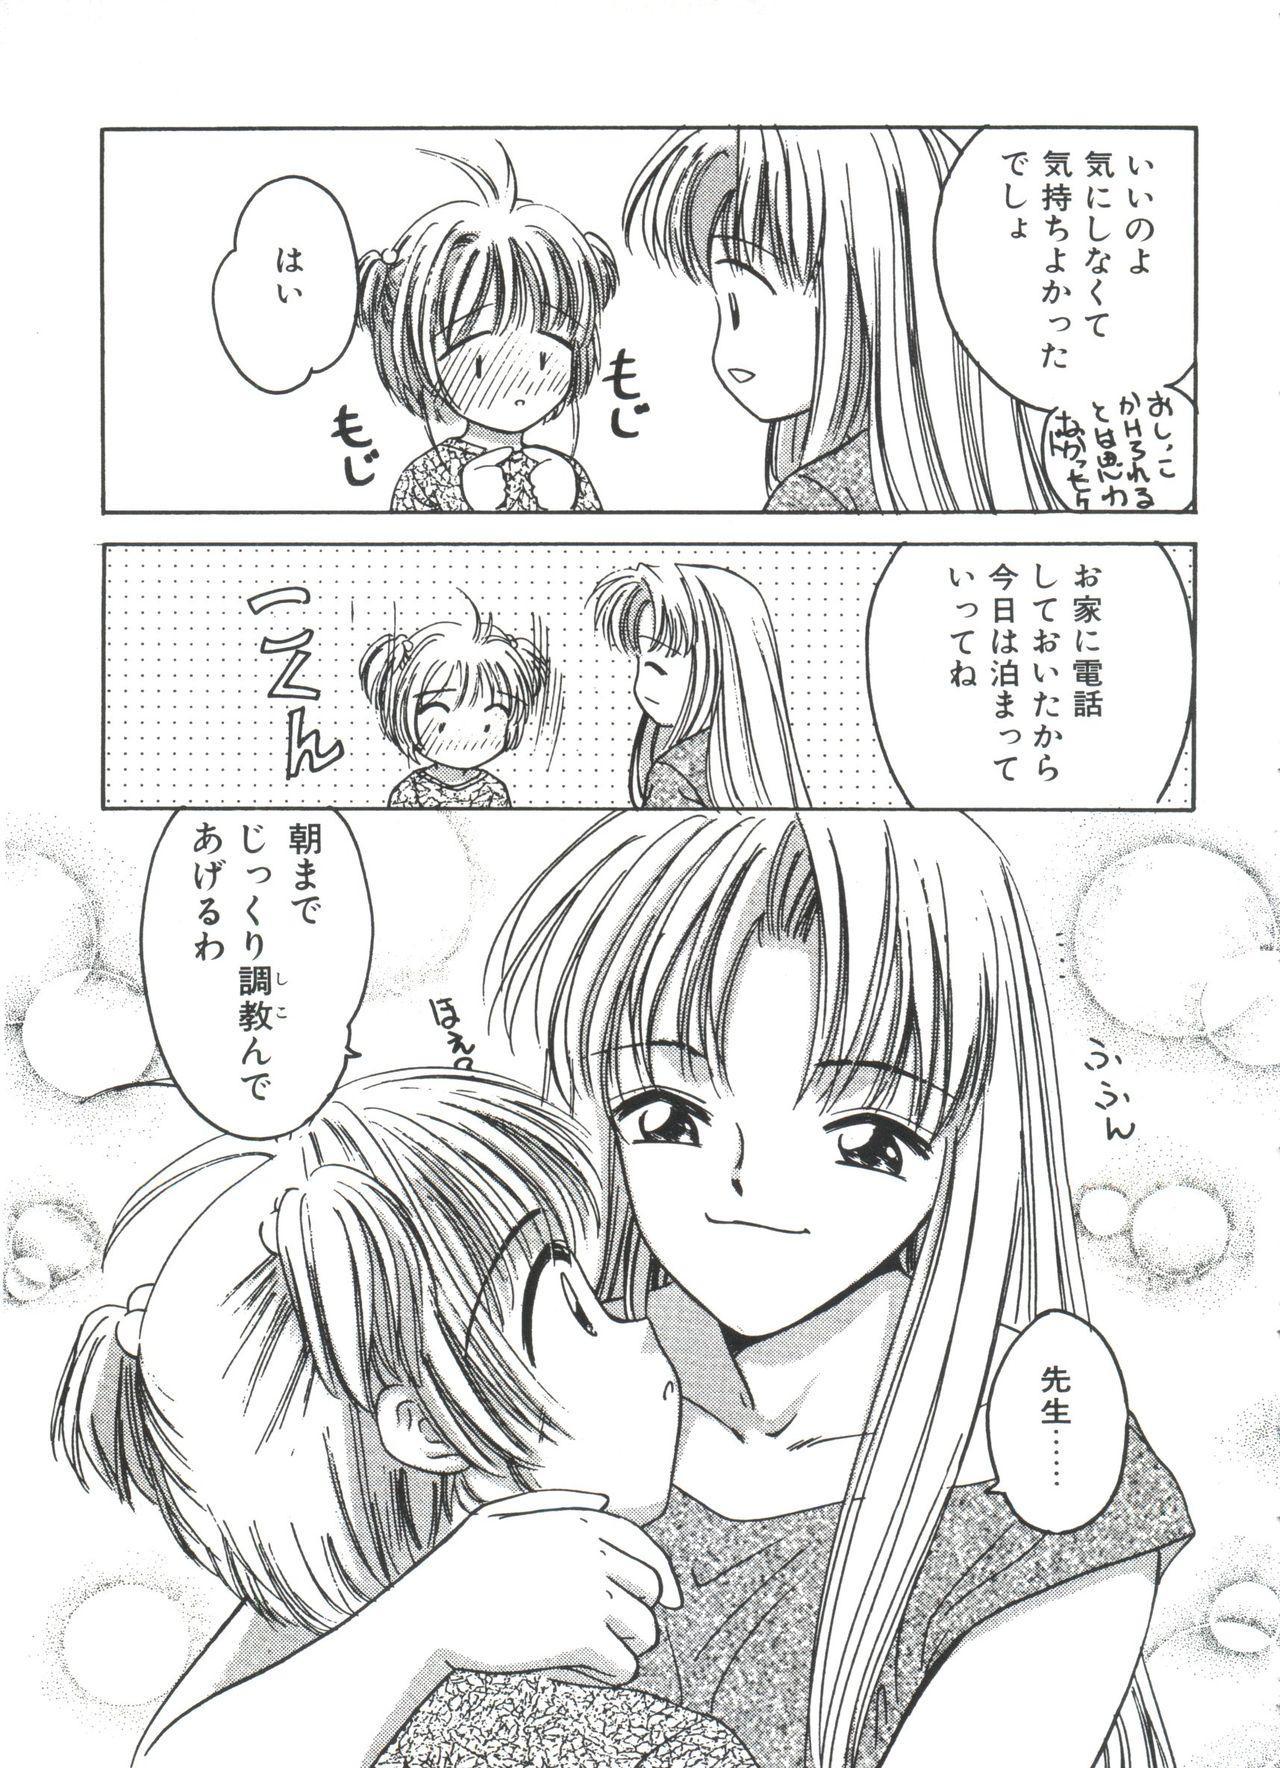 Ero-chan to Issho 2 16